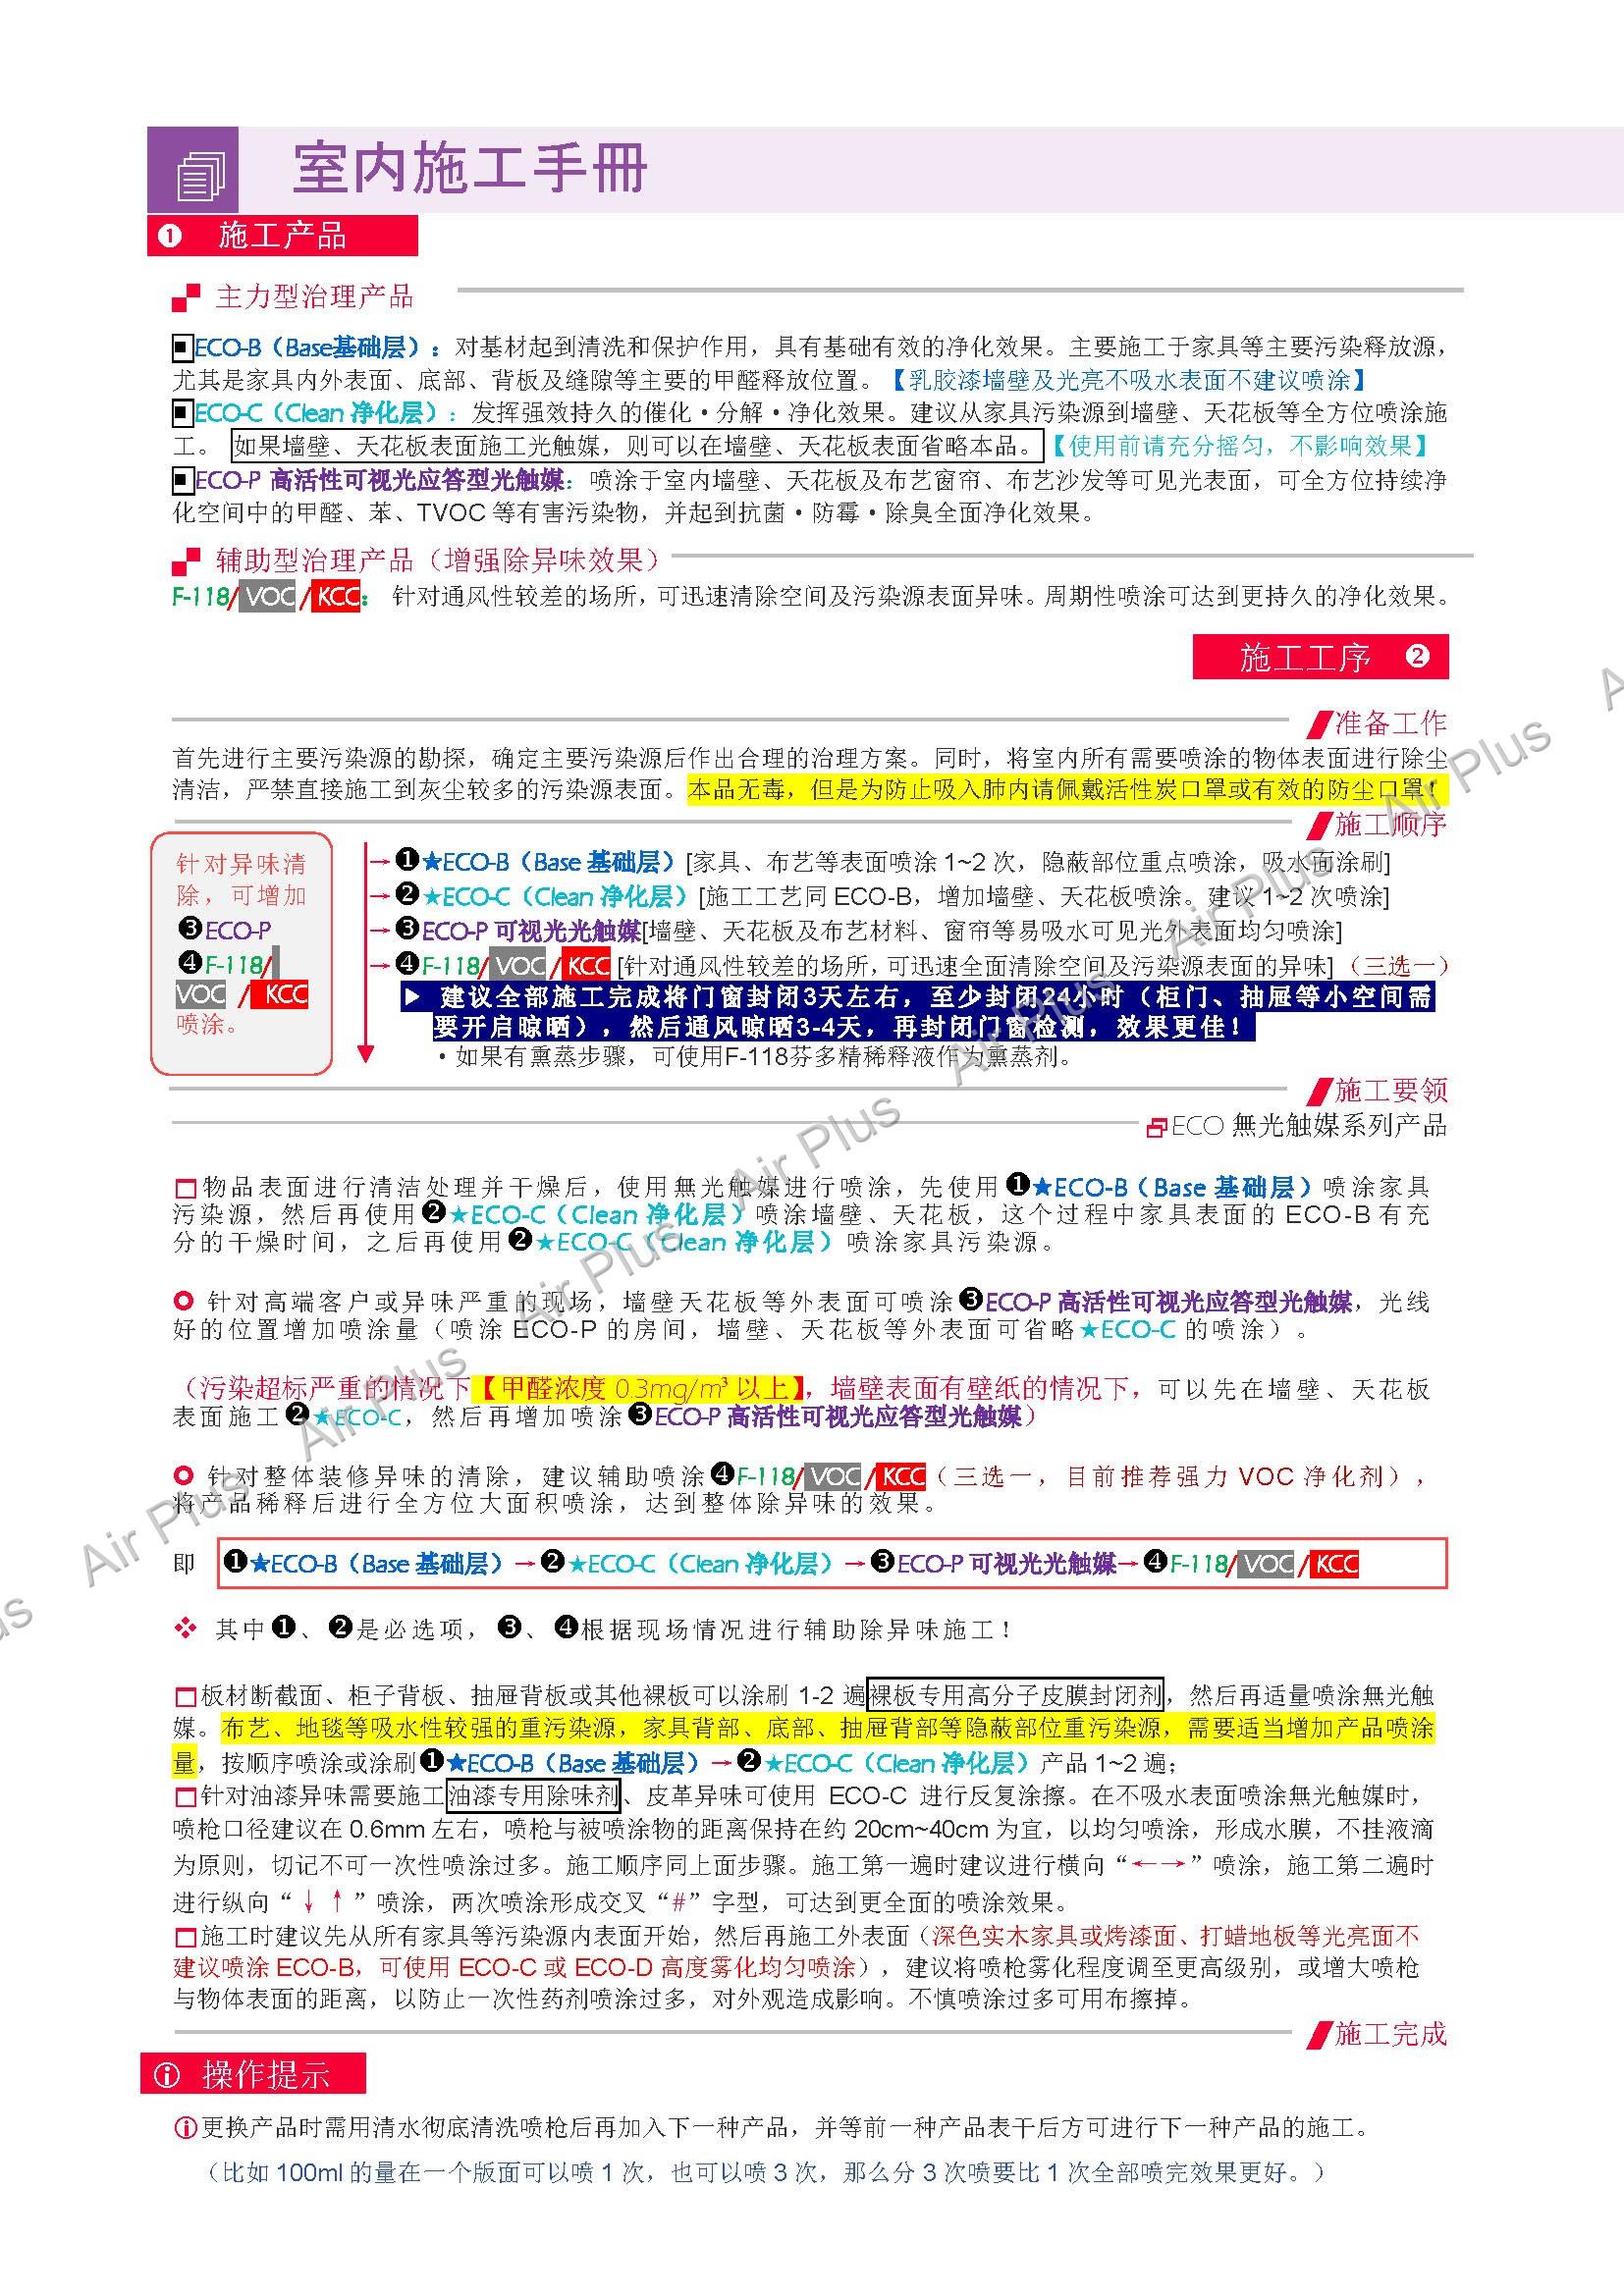 ★JP-ECO日本淨化製品-施工手册_页面_21.jpg